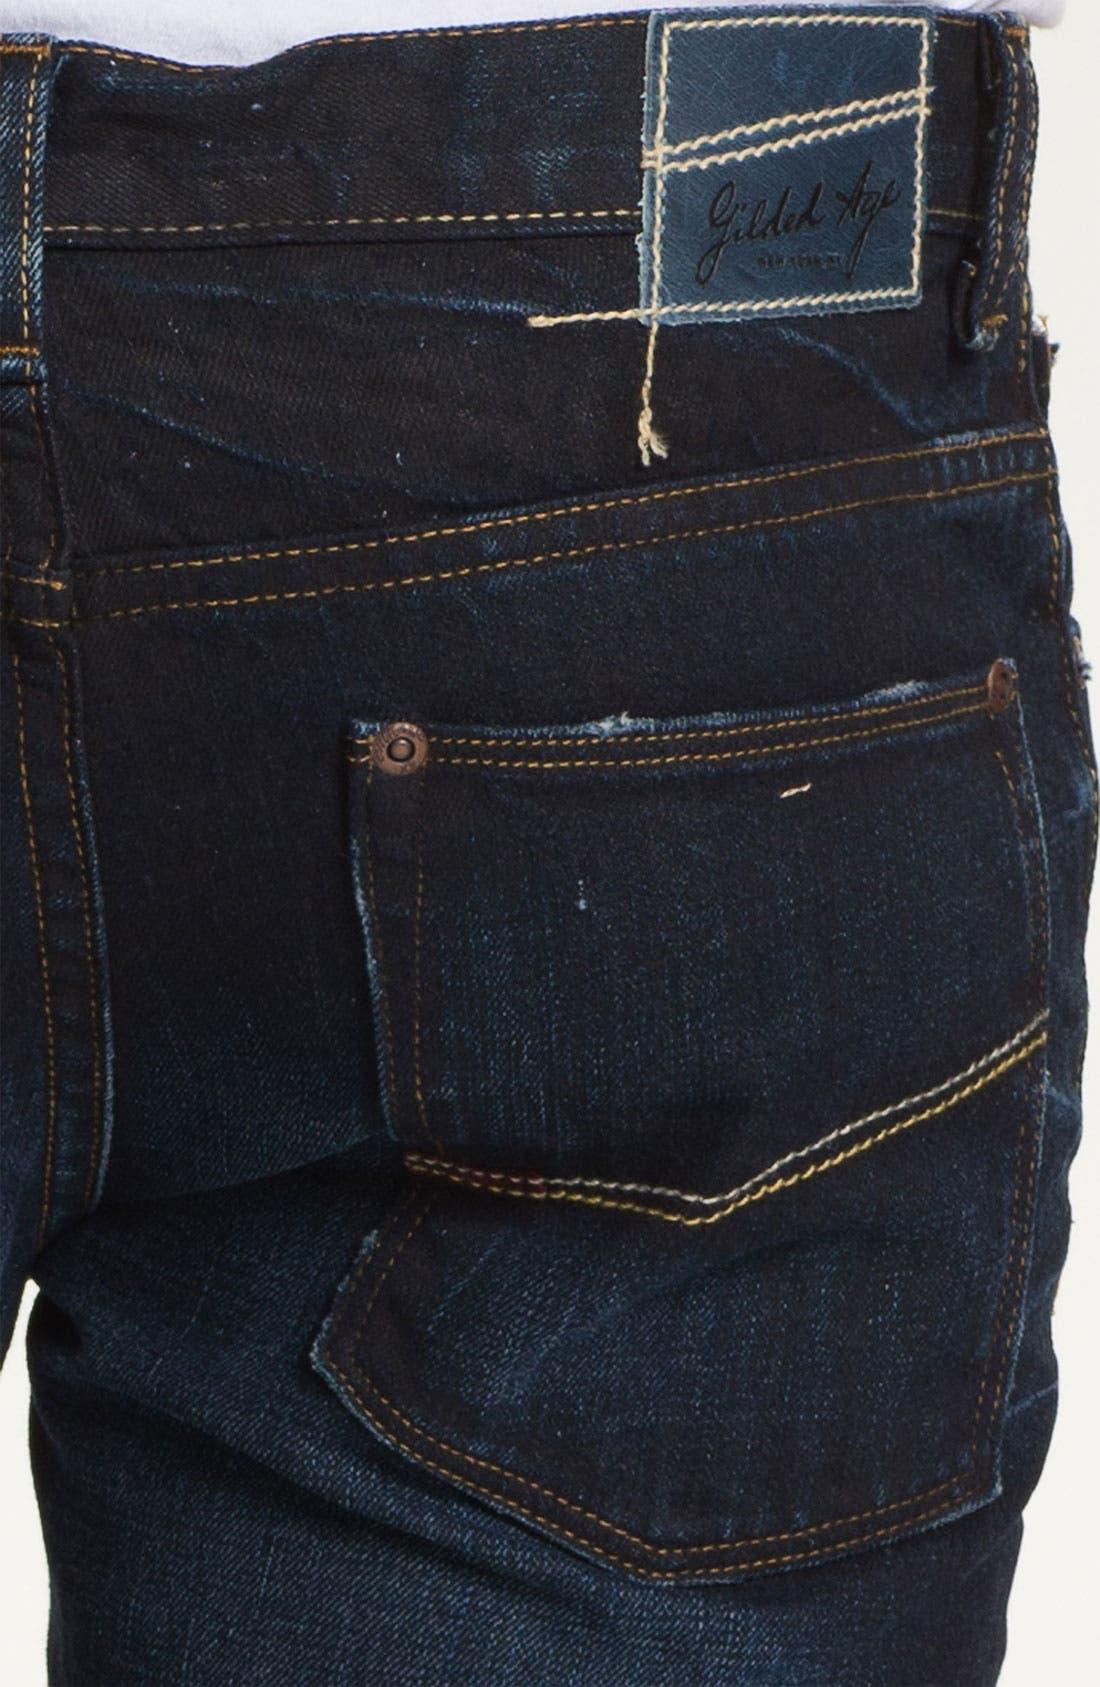 Alternate Image 4  - Gilded Age 'Gotham' Slim Straight Leg Jeans (Dark Wash)